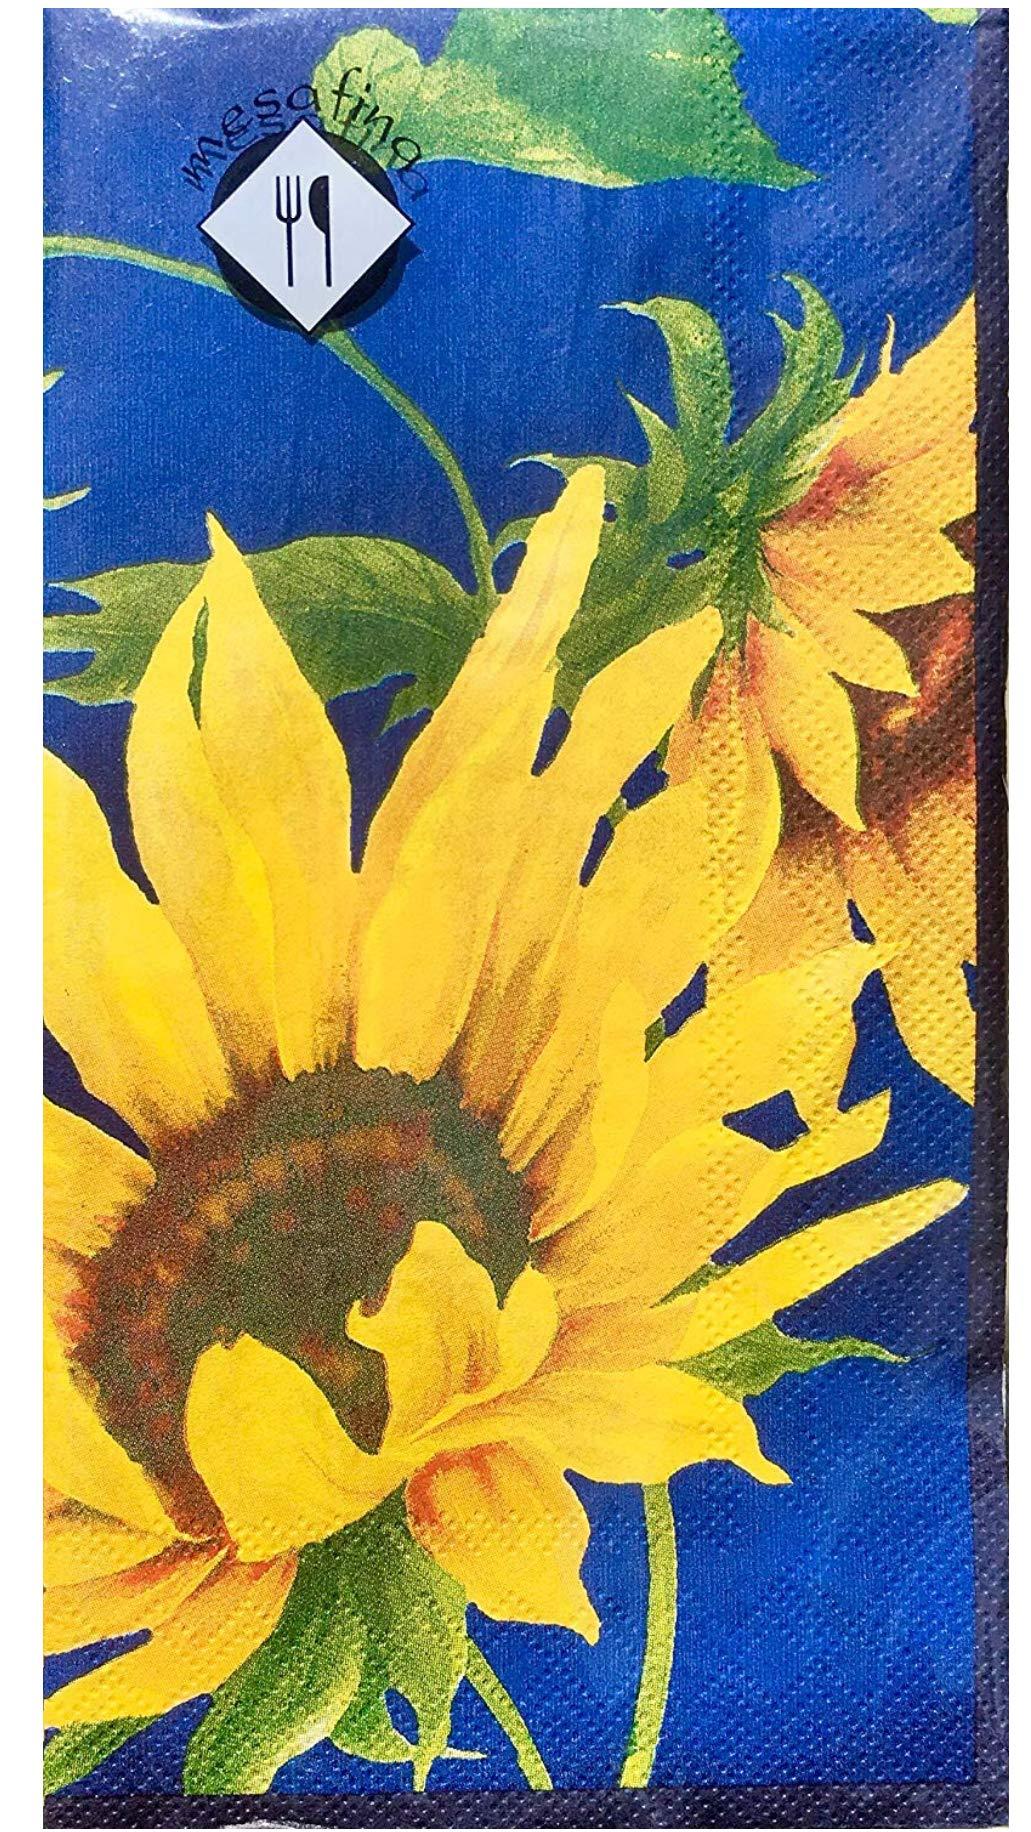 MesaFina Sunshine Blue Sunflower Guest Towels Buffet Napkins, 32 ct